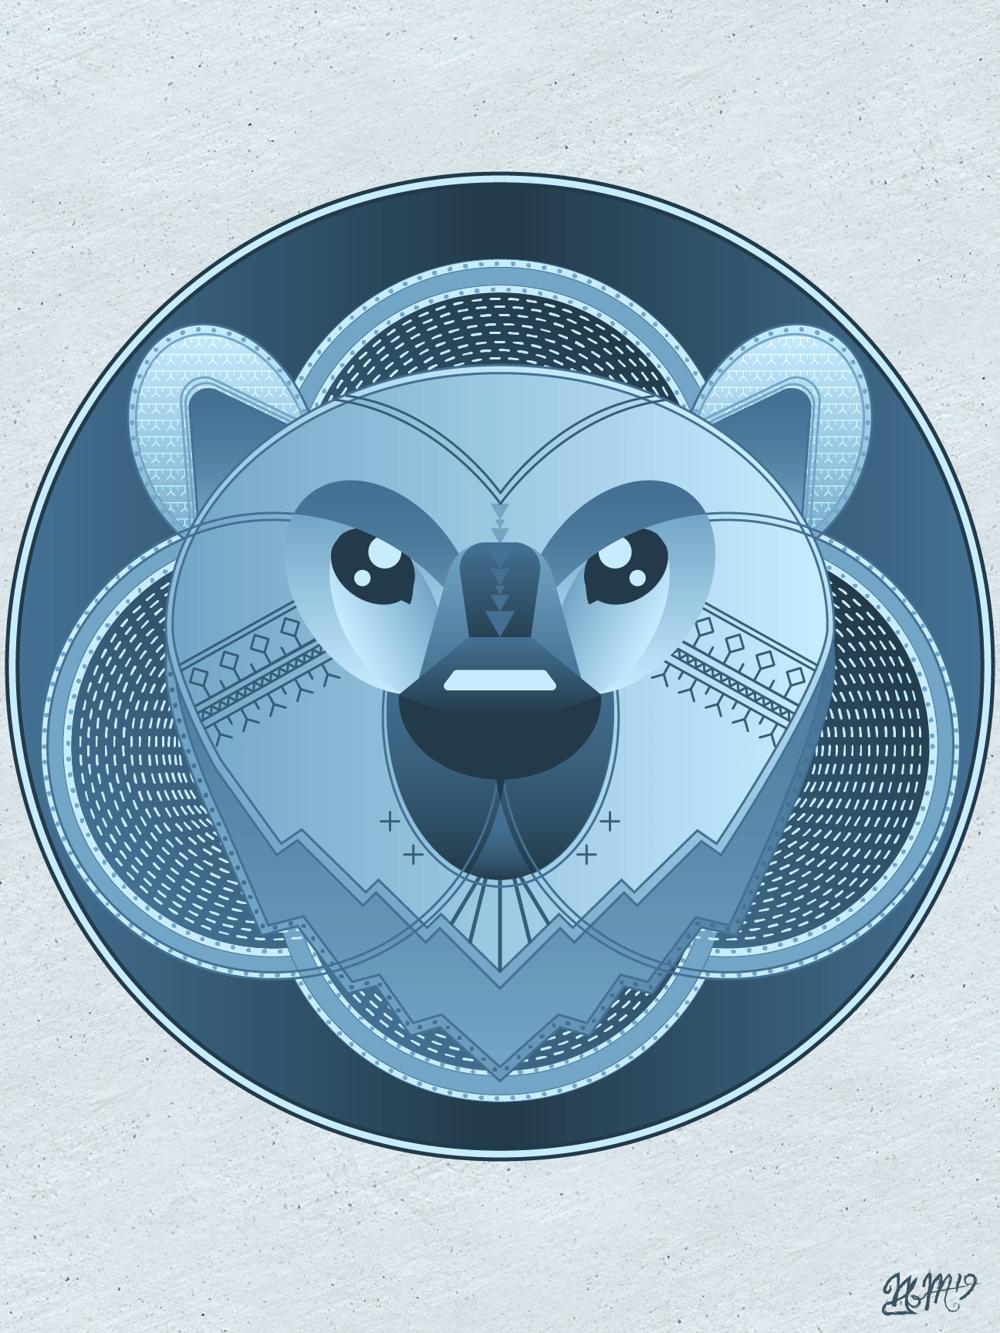 Polar Bear - image 3 - student project